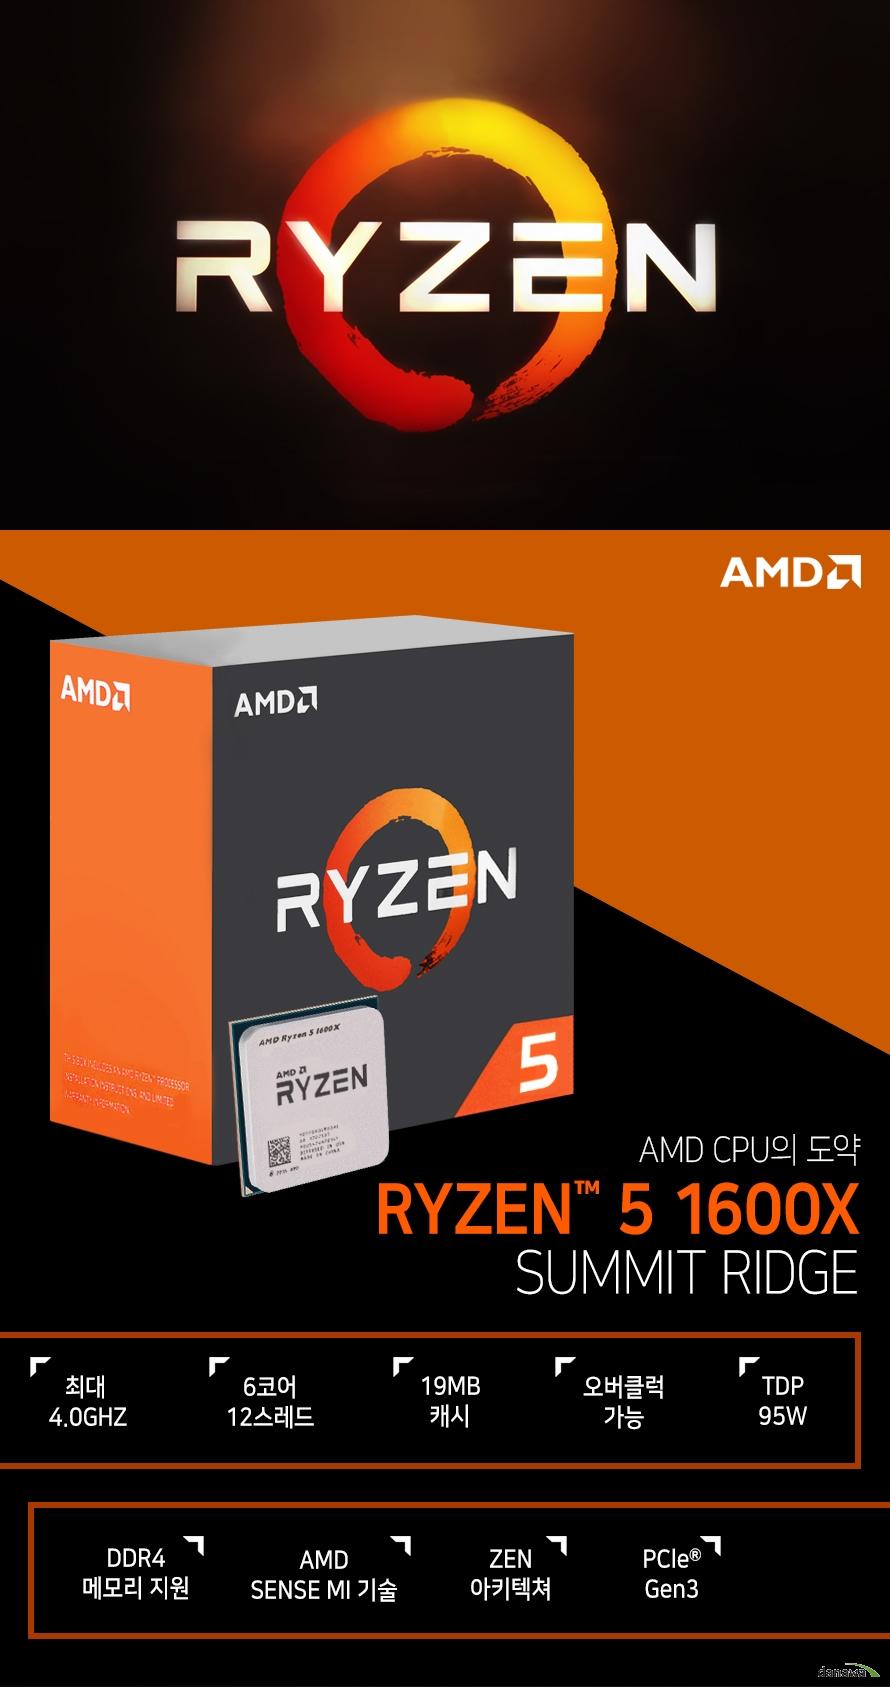 AMD CPU의 도약         RYZEN 5 1600X         SUMMIT RIDGE                  최대 4.0GHZ          6코어 12스레드         19MB 캐시         오버클럭 가능         TDP 95W         DDR4 메모리 지원         AMD SENSE MI 기술         ZEN 아키텍쳐         PCle Gen 3